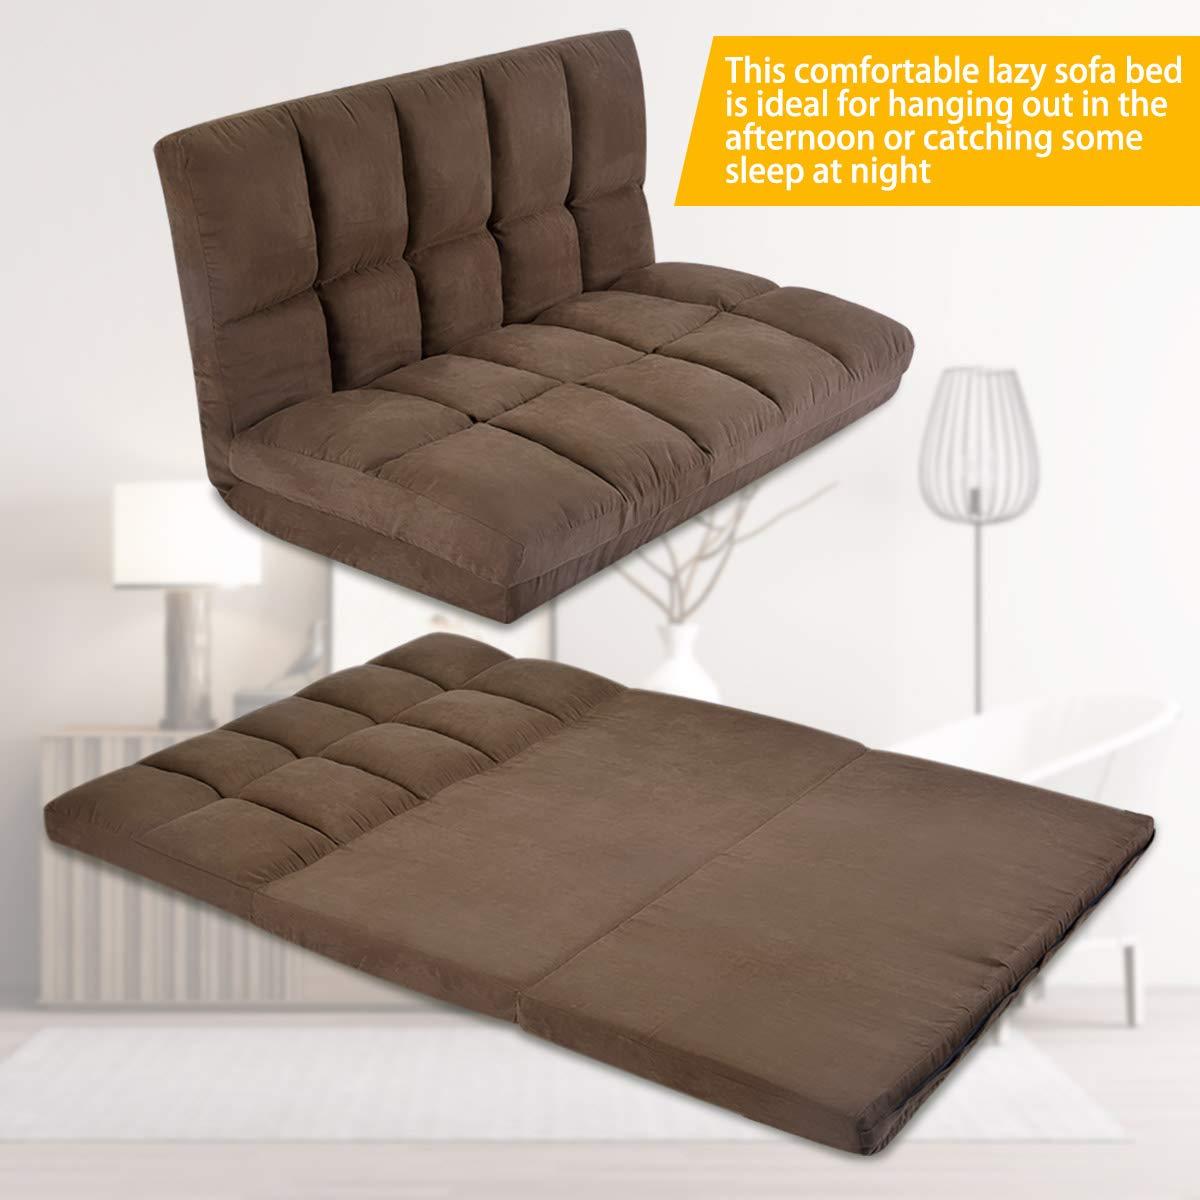 Amazon.com: Merax Adjustabale Sofá cama de suelo, sofá para ...